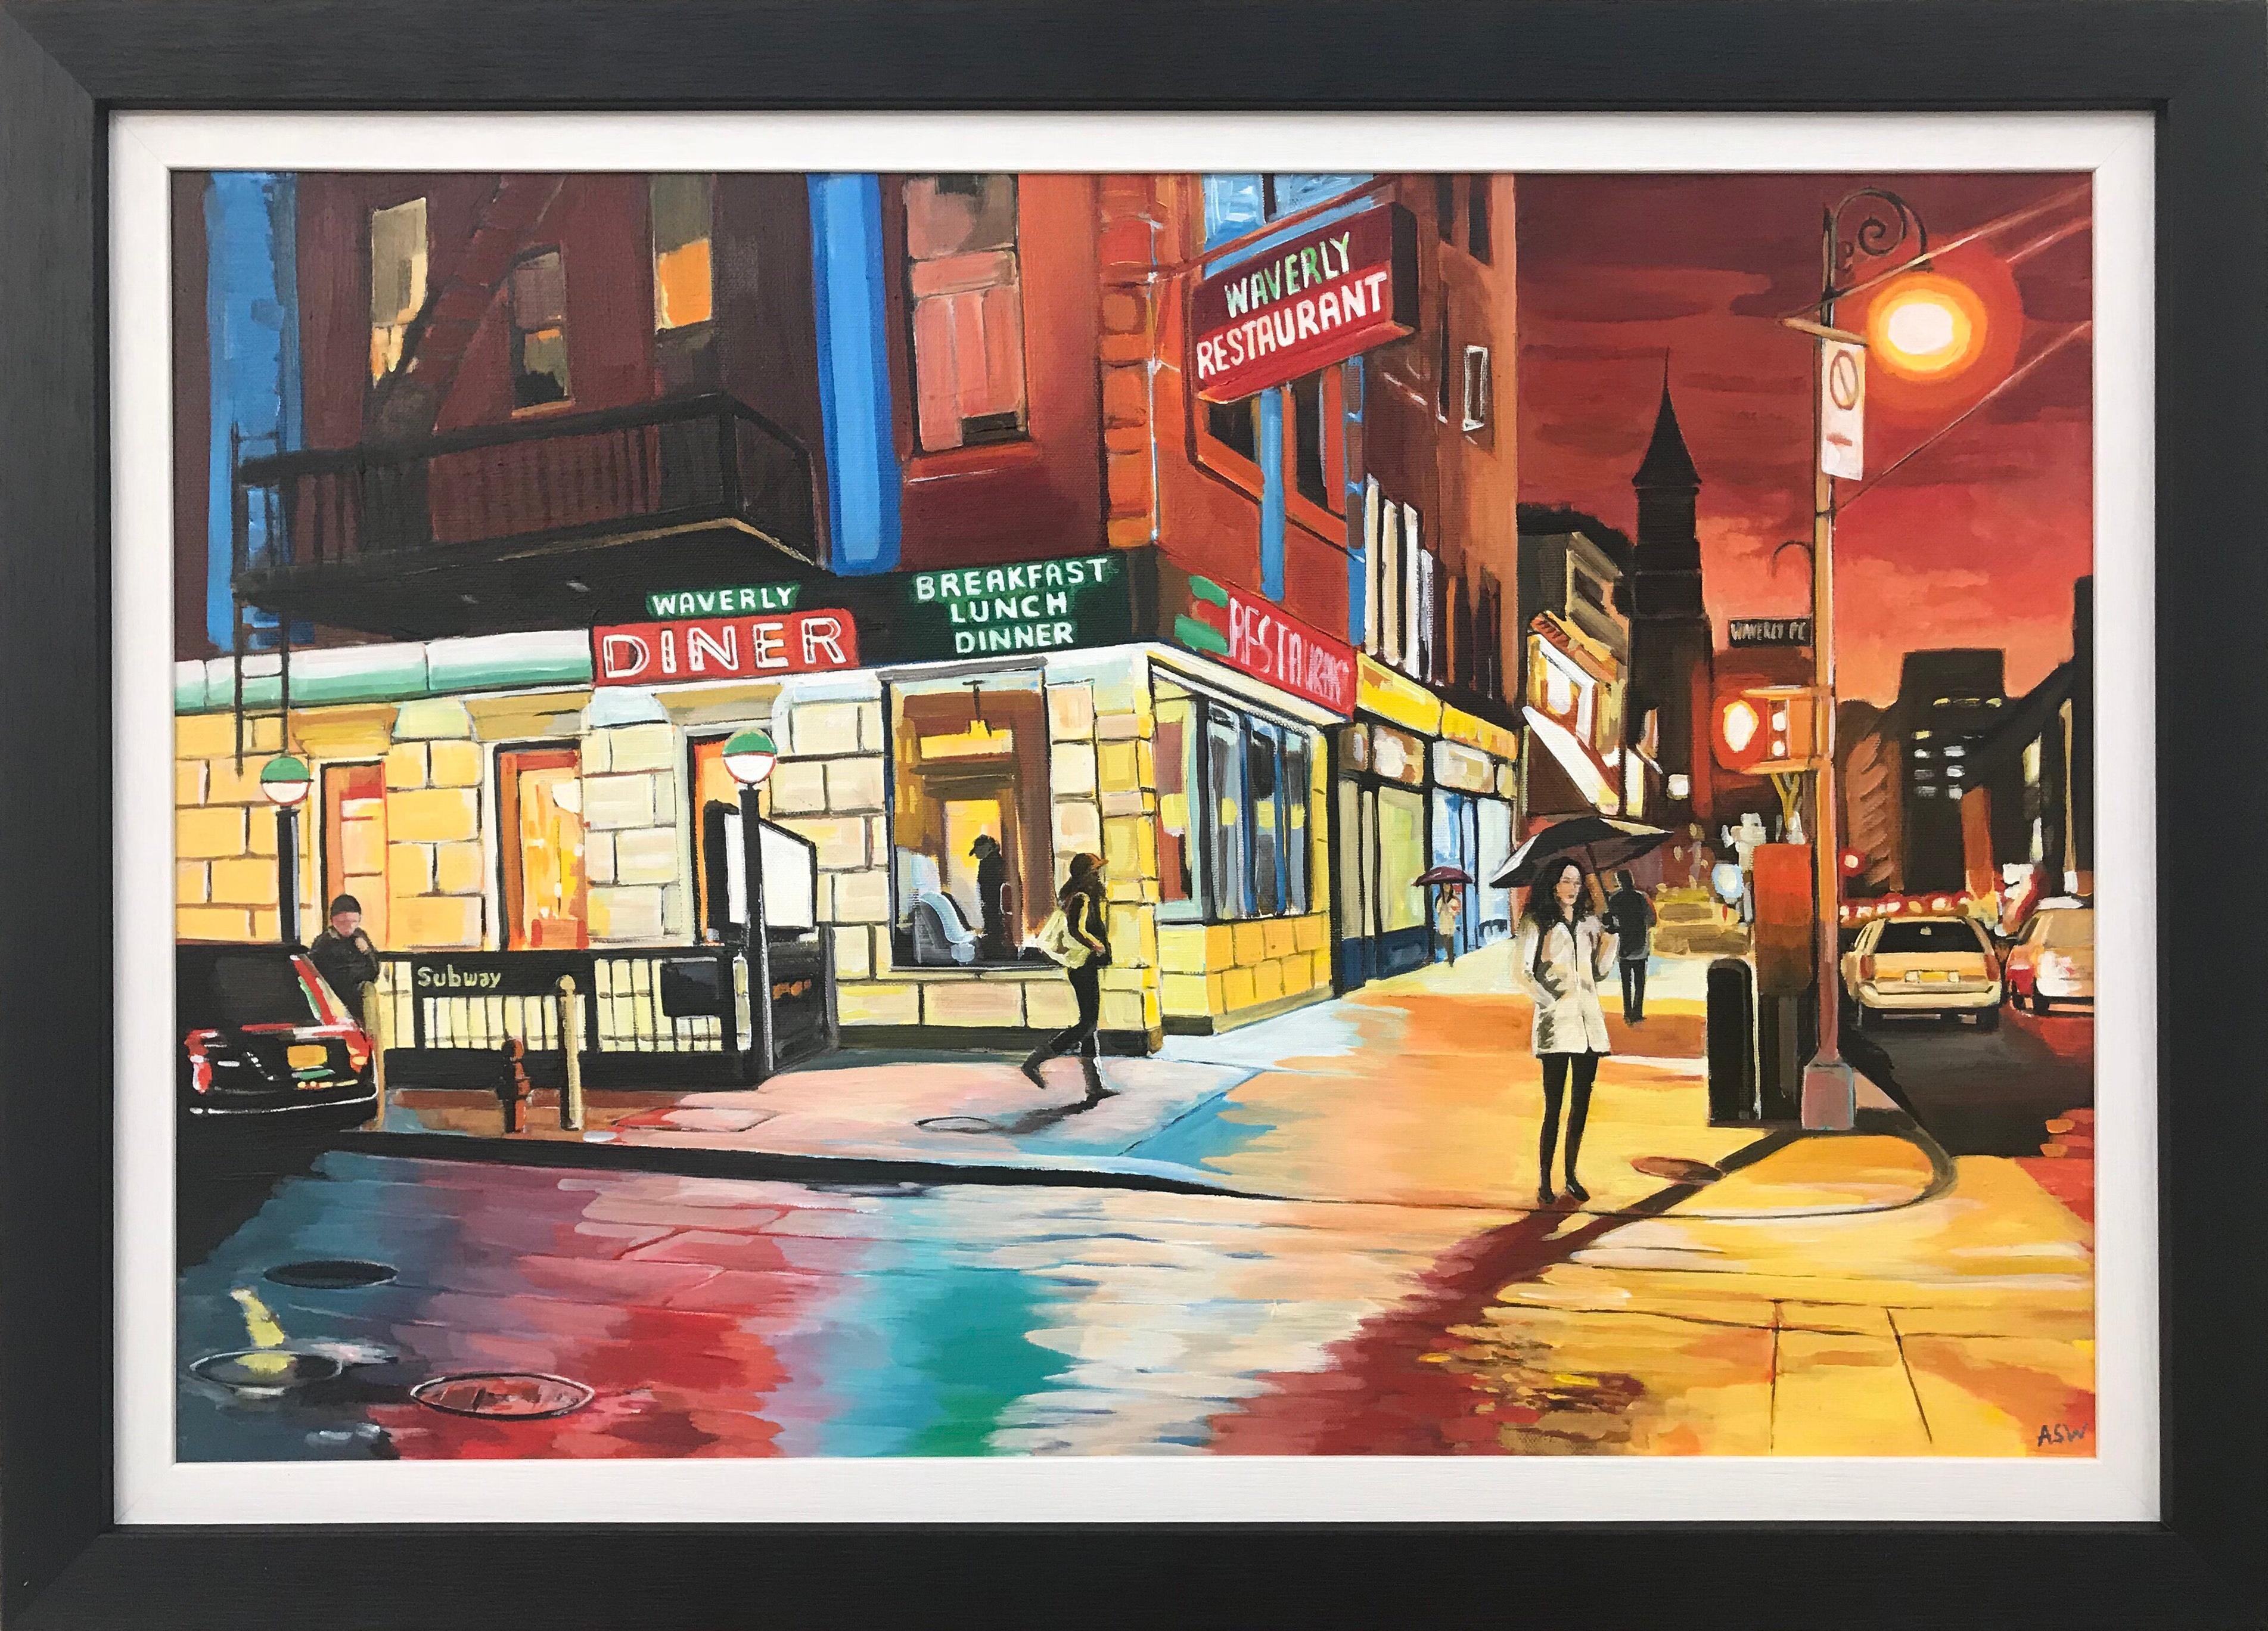 American Diner Greenwich Village 6th Avenue New York City NYC by British Artist